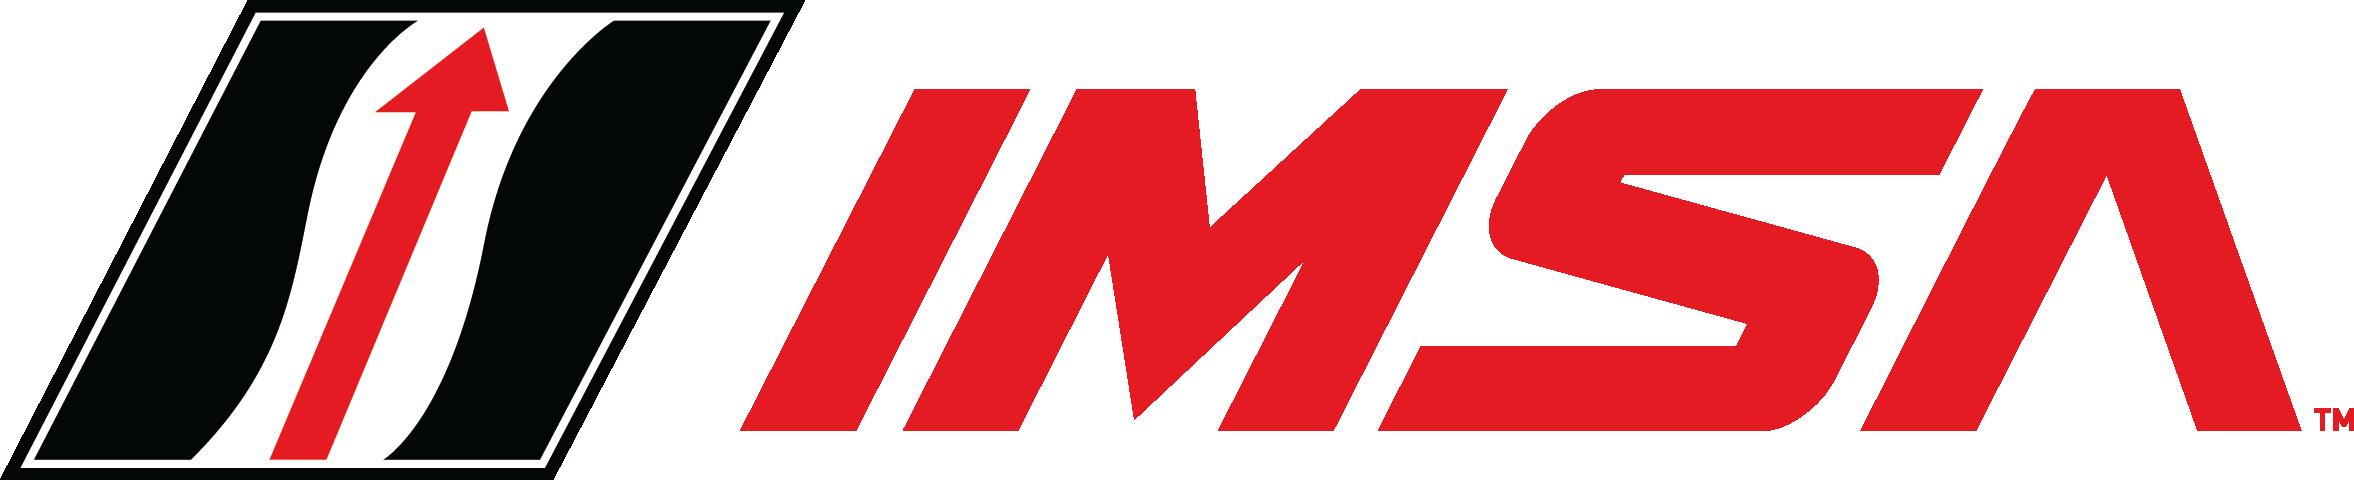 IMSA_4C.png